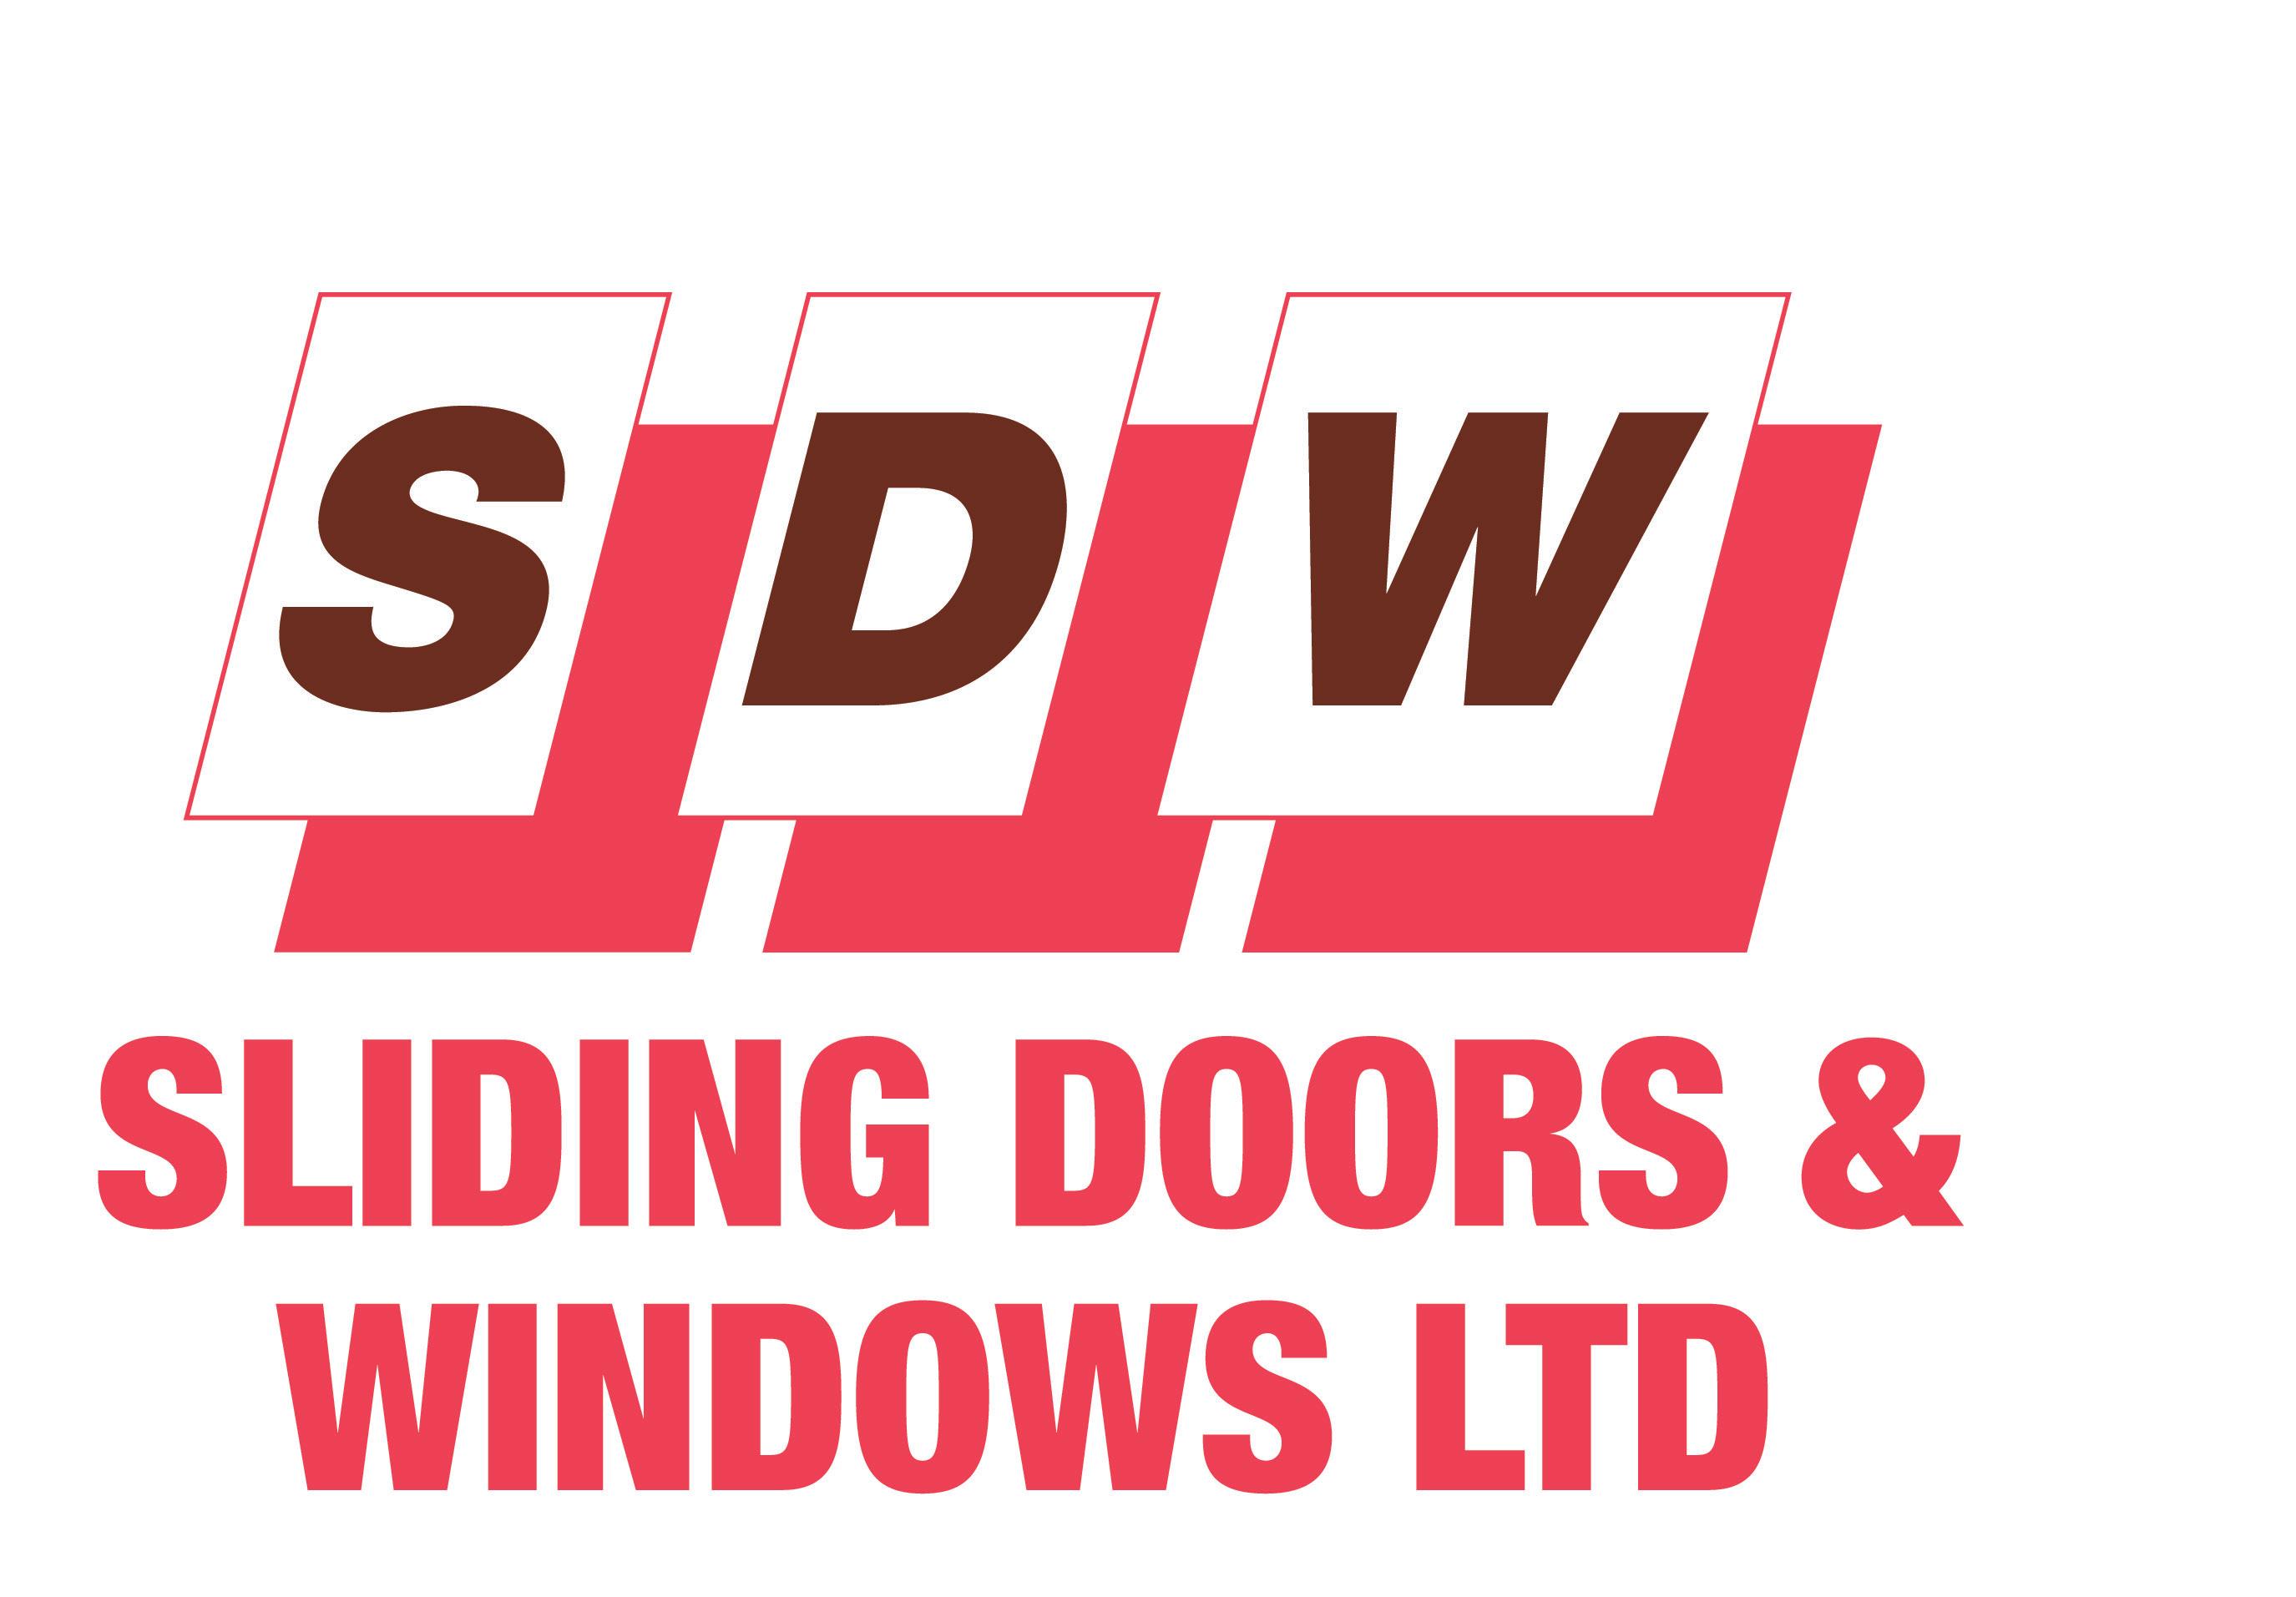 Sliding Doors & Windows Limited